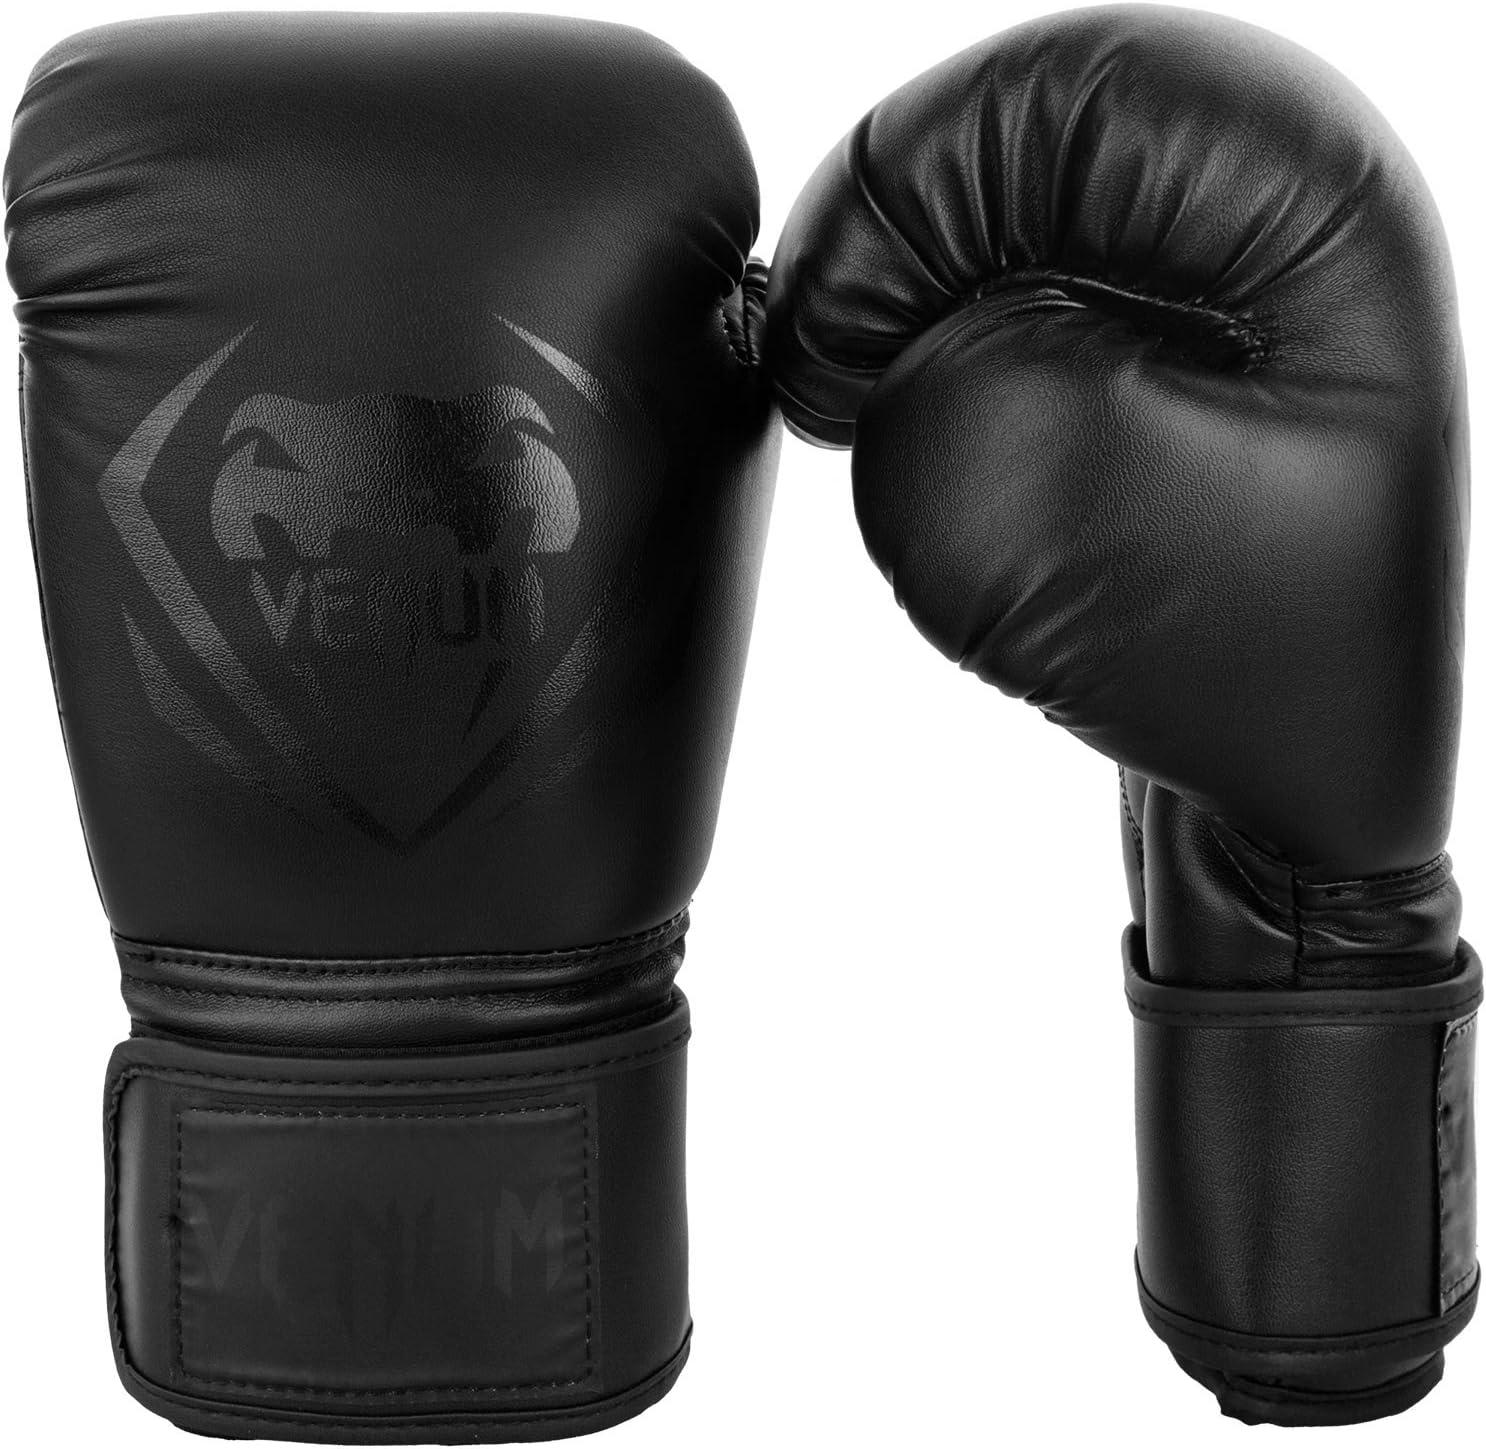 Pro Box Inner Gloves Boxing Kickboxing Martial Arts Hygeine Wraps Black Gold